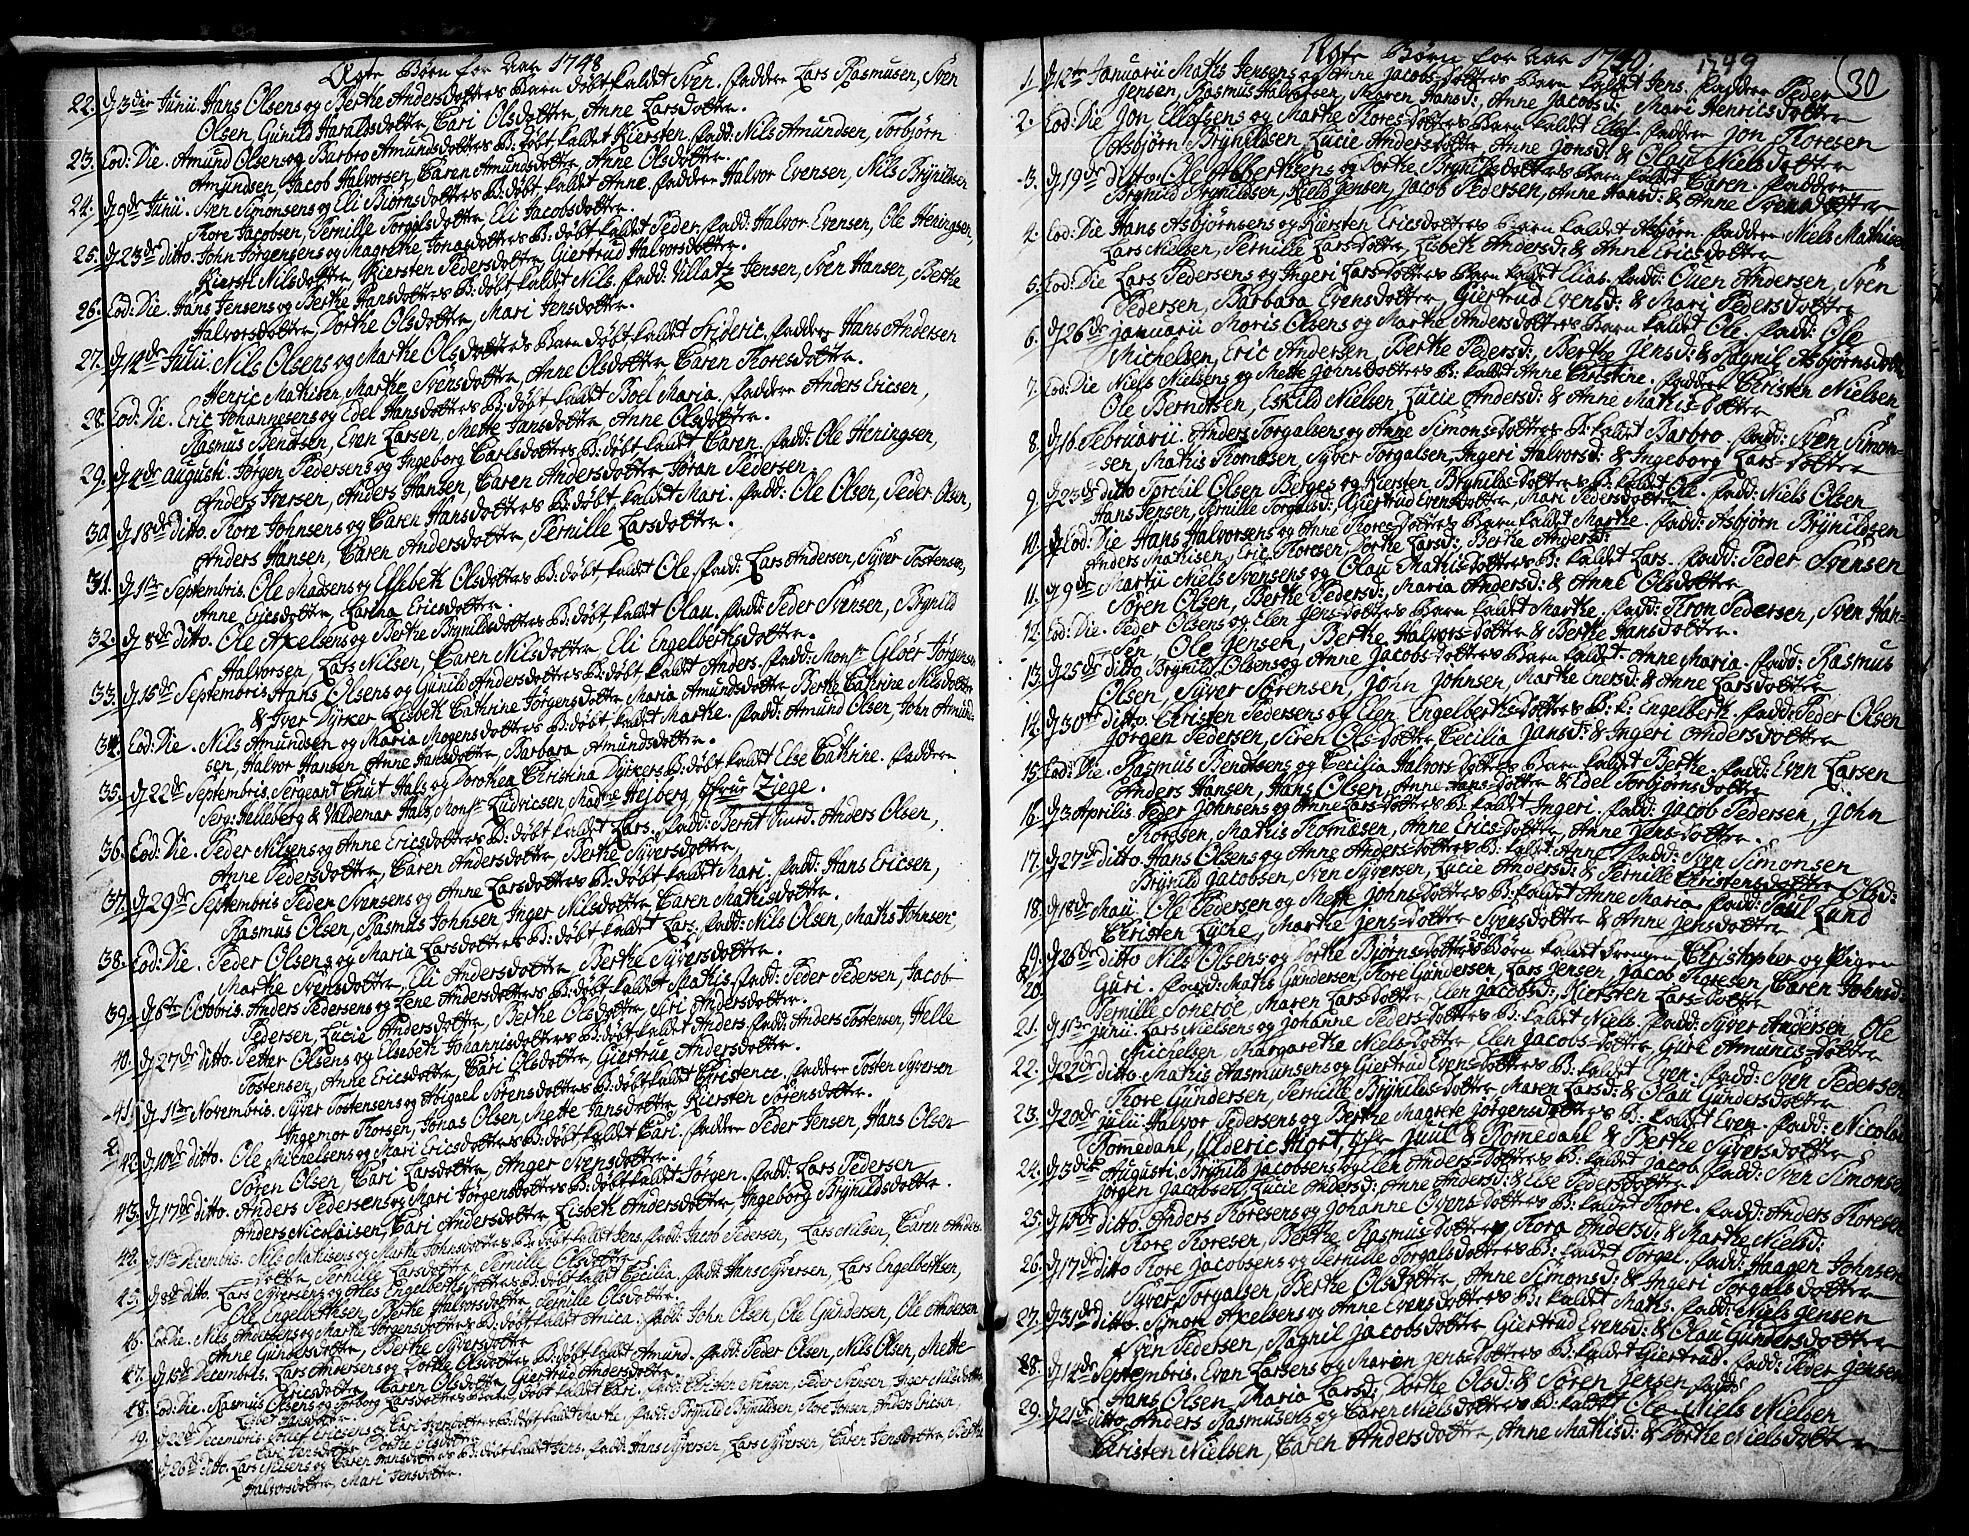 SAO, Idd prestekontor Kirkebøker, F/Fa/L0001: Ministerialbok nr. I 1, 1720-1769, s. 30